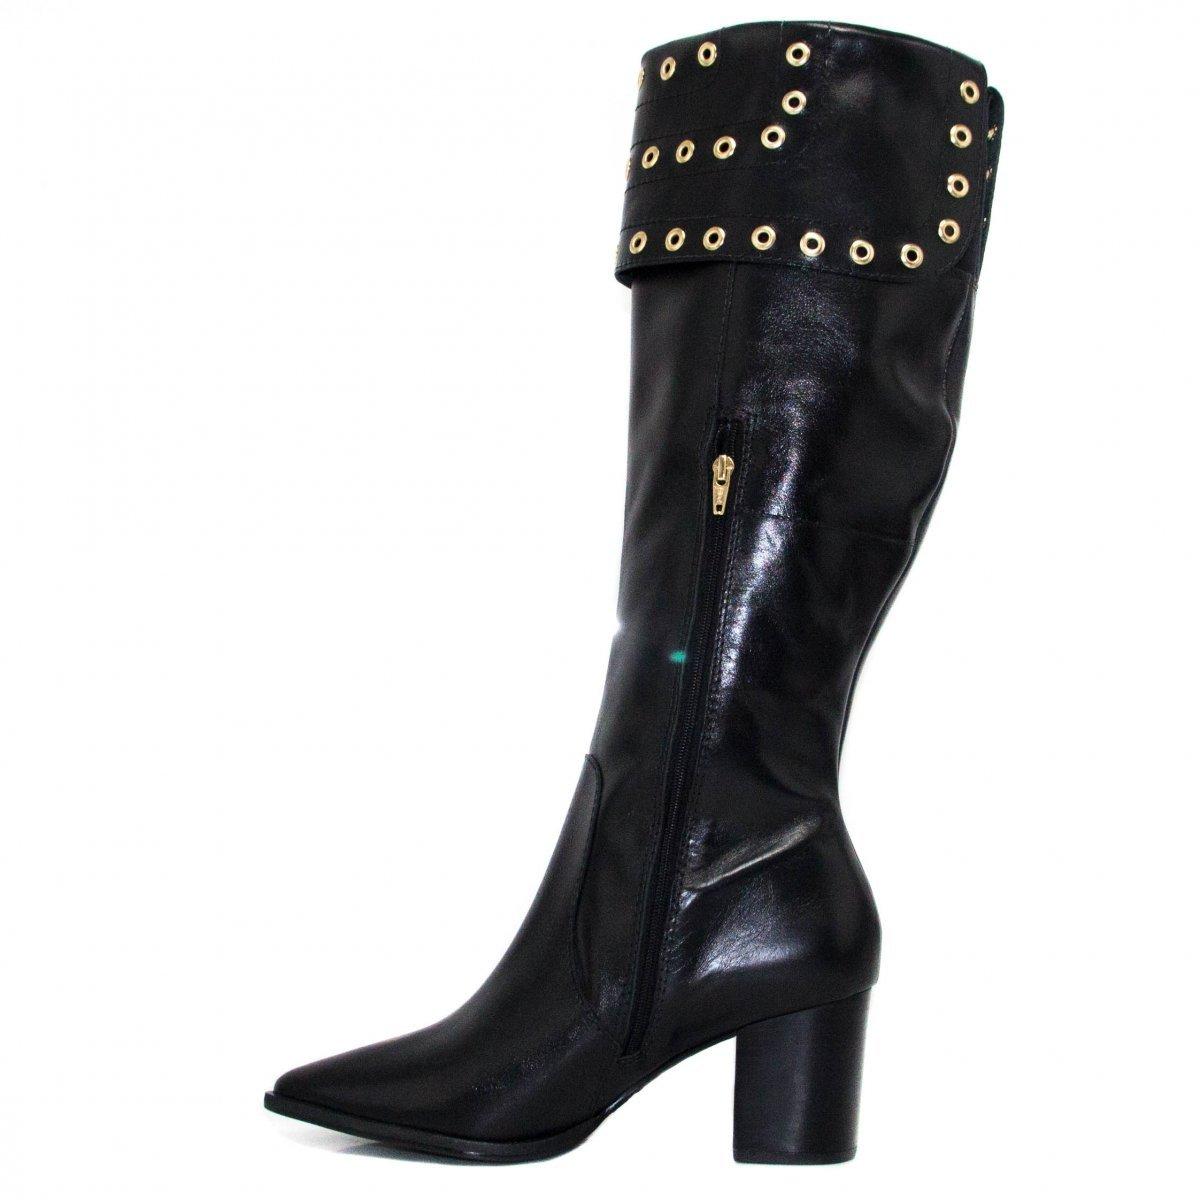 Bota Zariff Shoes Montaria em Couro Zíper Feminina - Preto